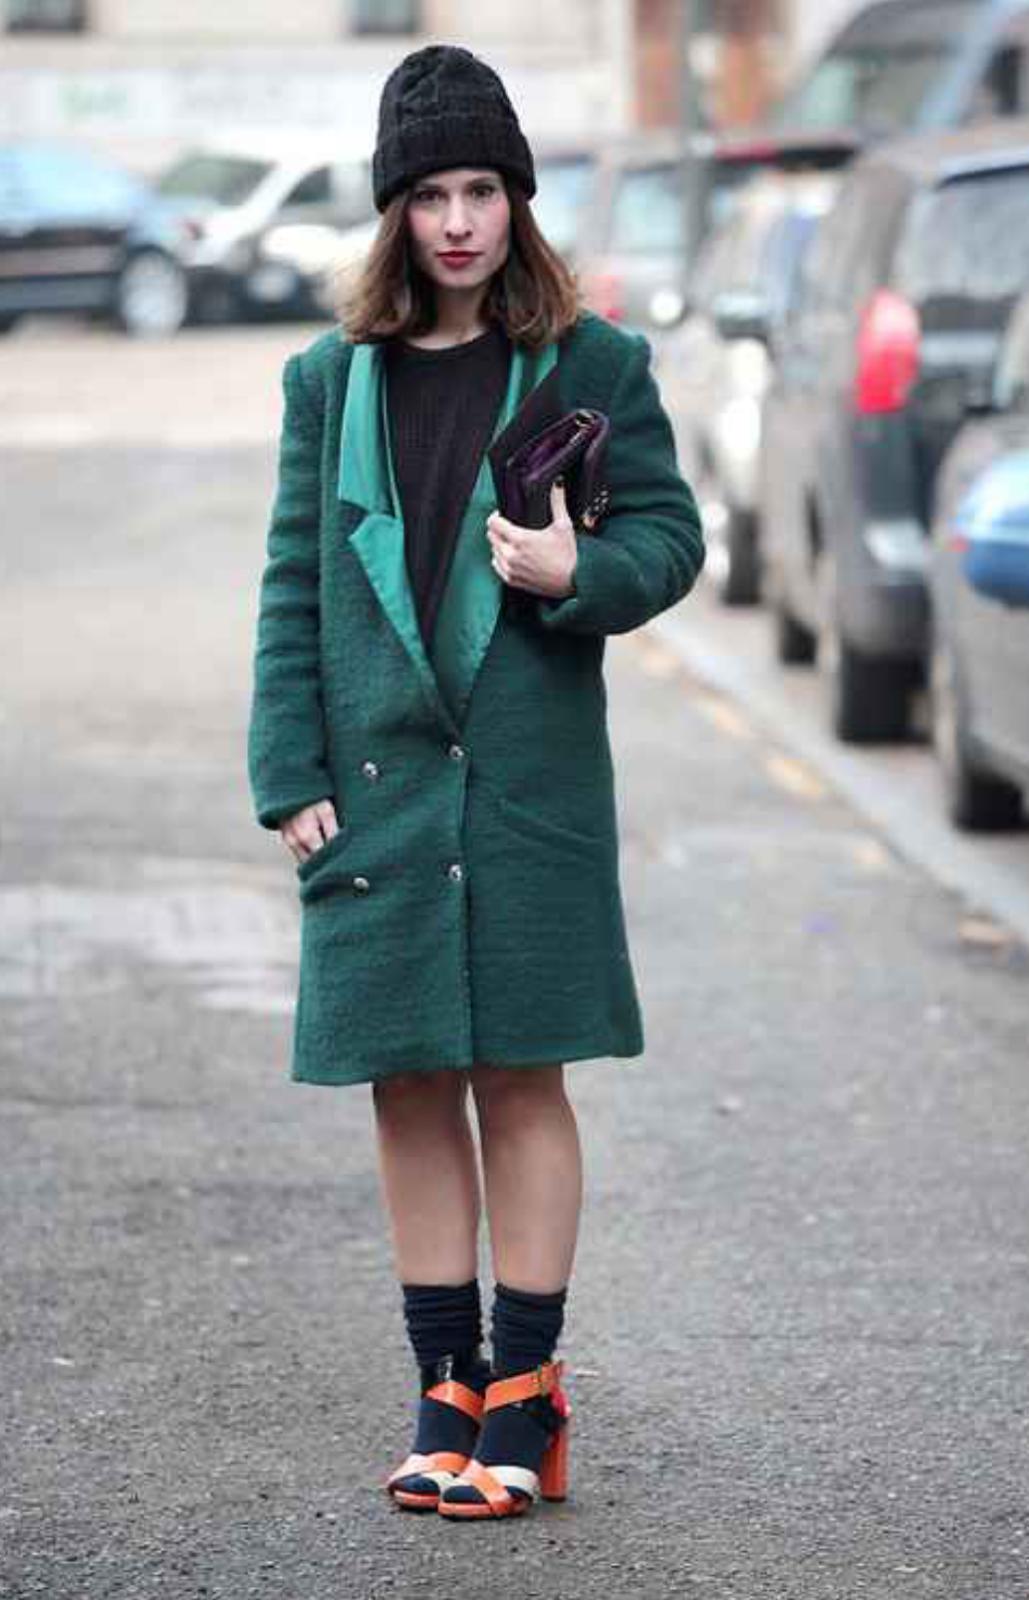 Abrigo estilo másculino en verde